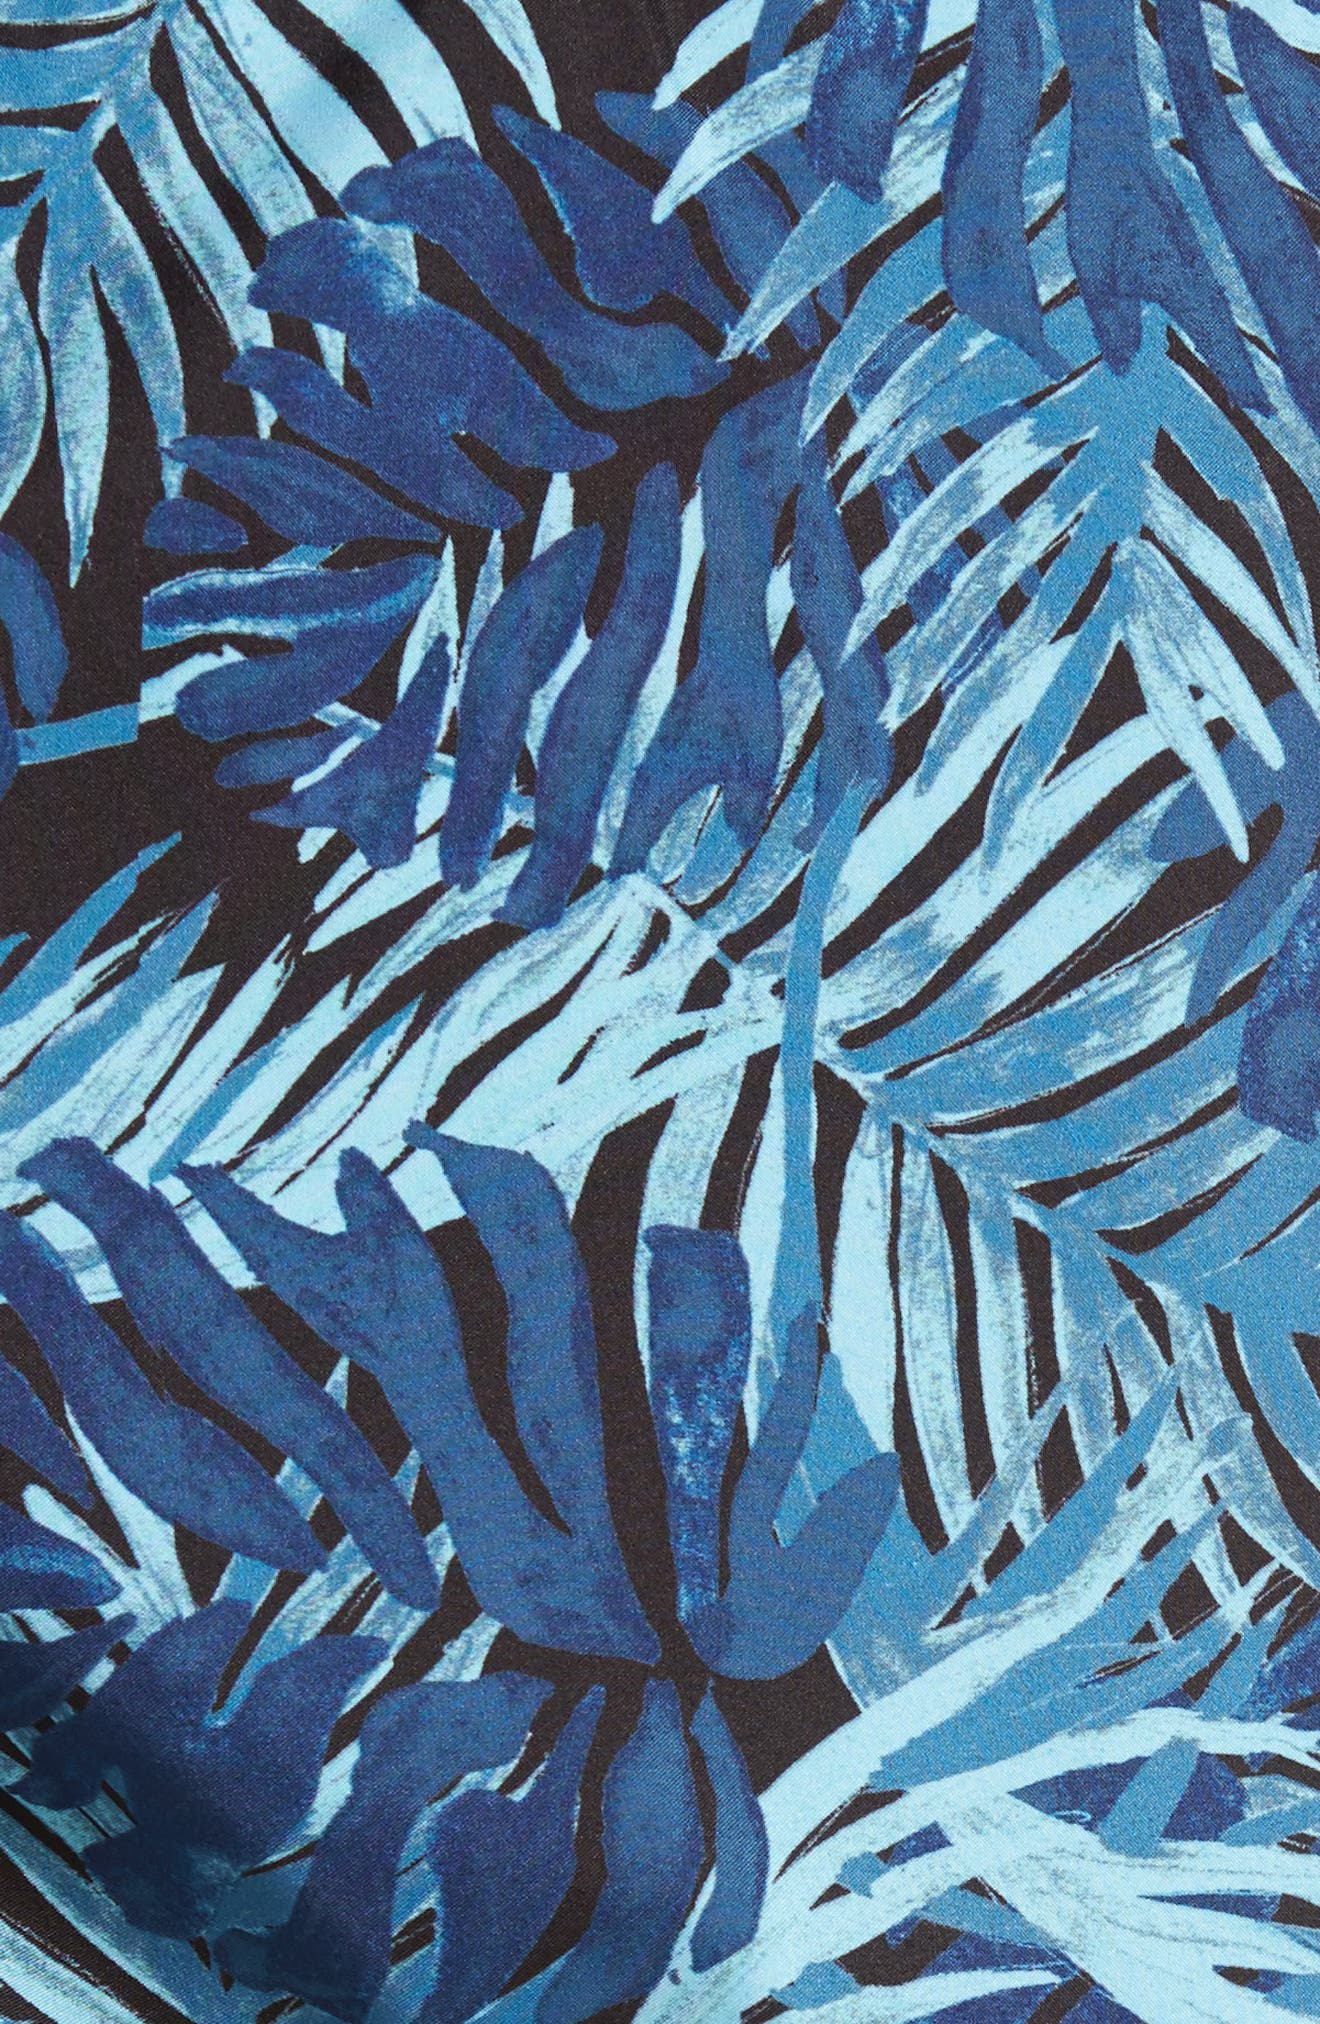 Mahina Madrague Print Packable Swim Trunks,                             Alternate thumbnail 5, color,                             NAVY BLUE